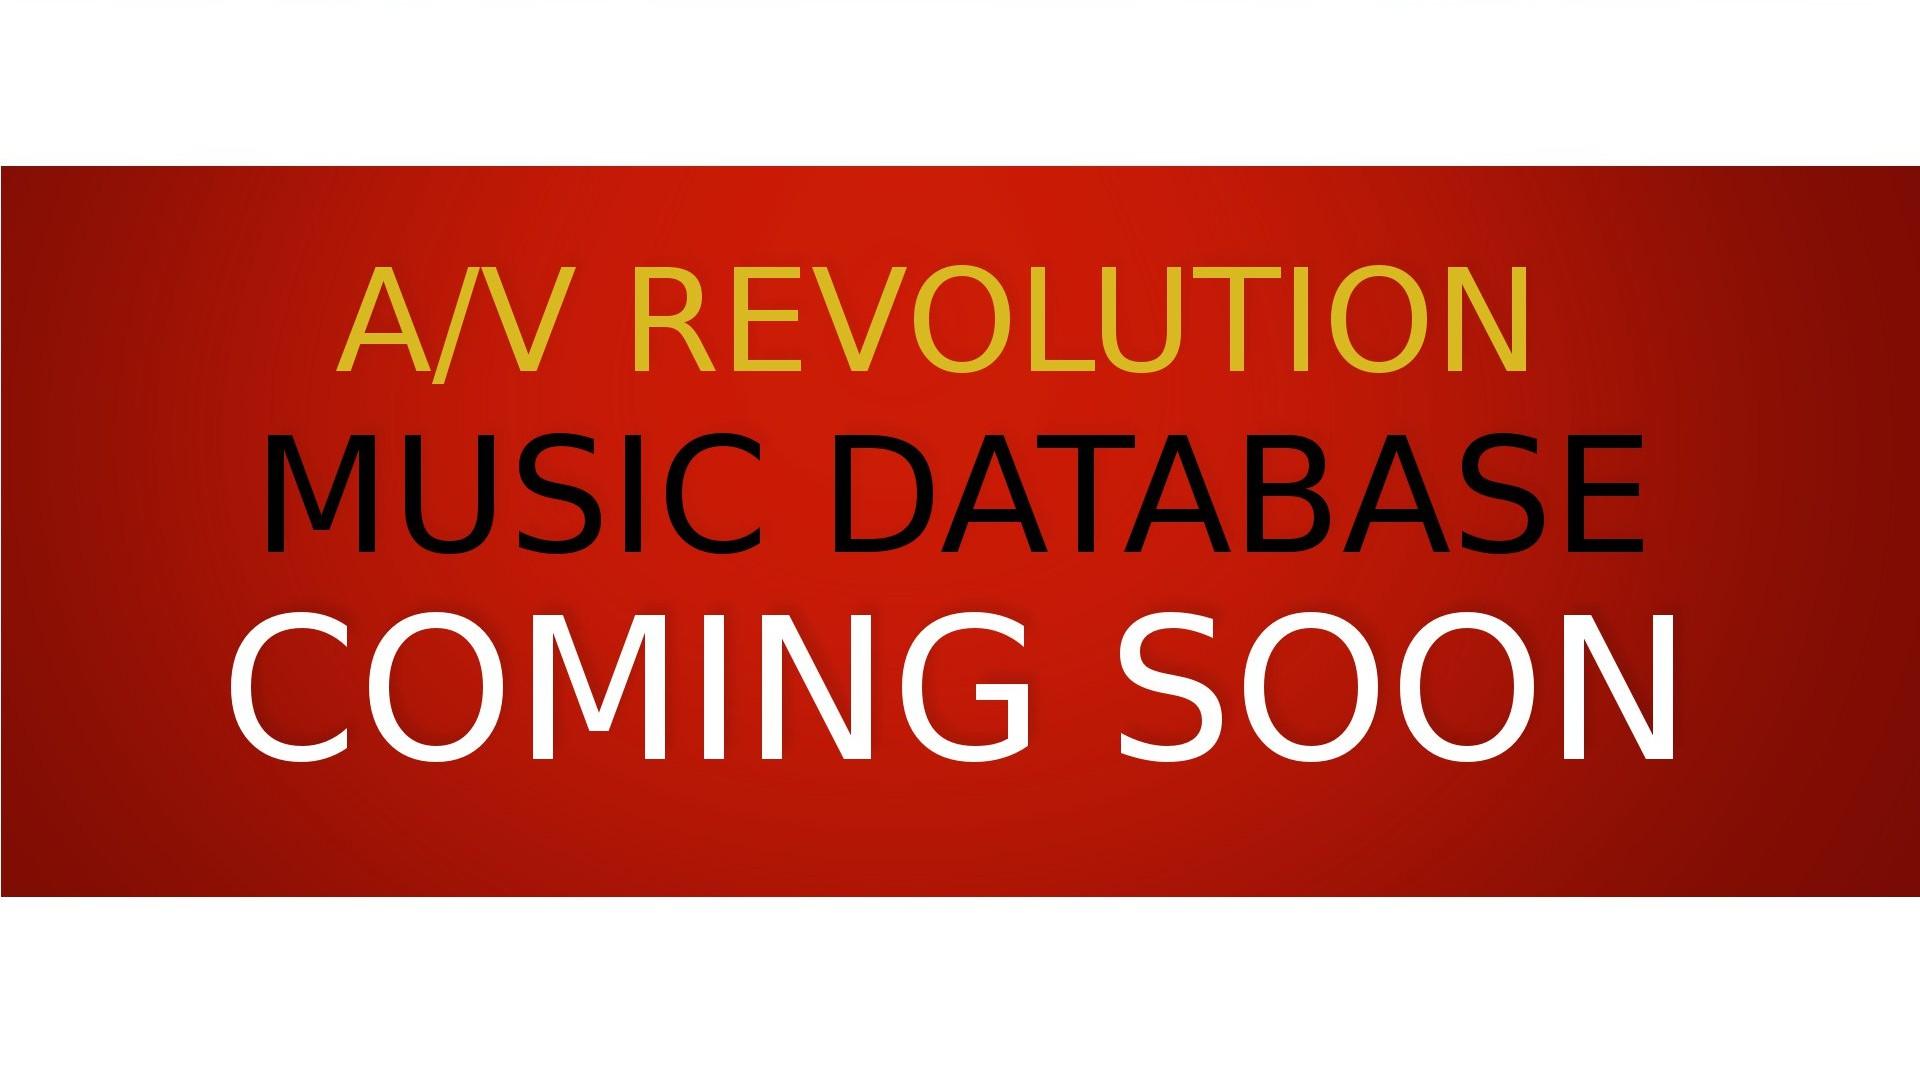 AVR Database Coming soon